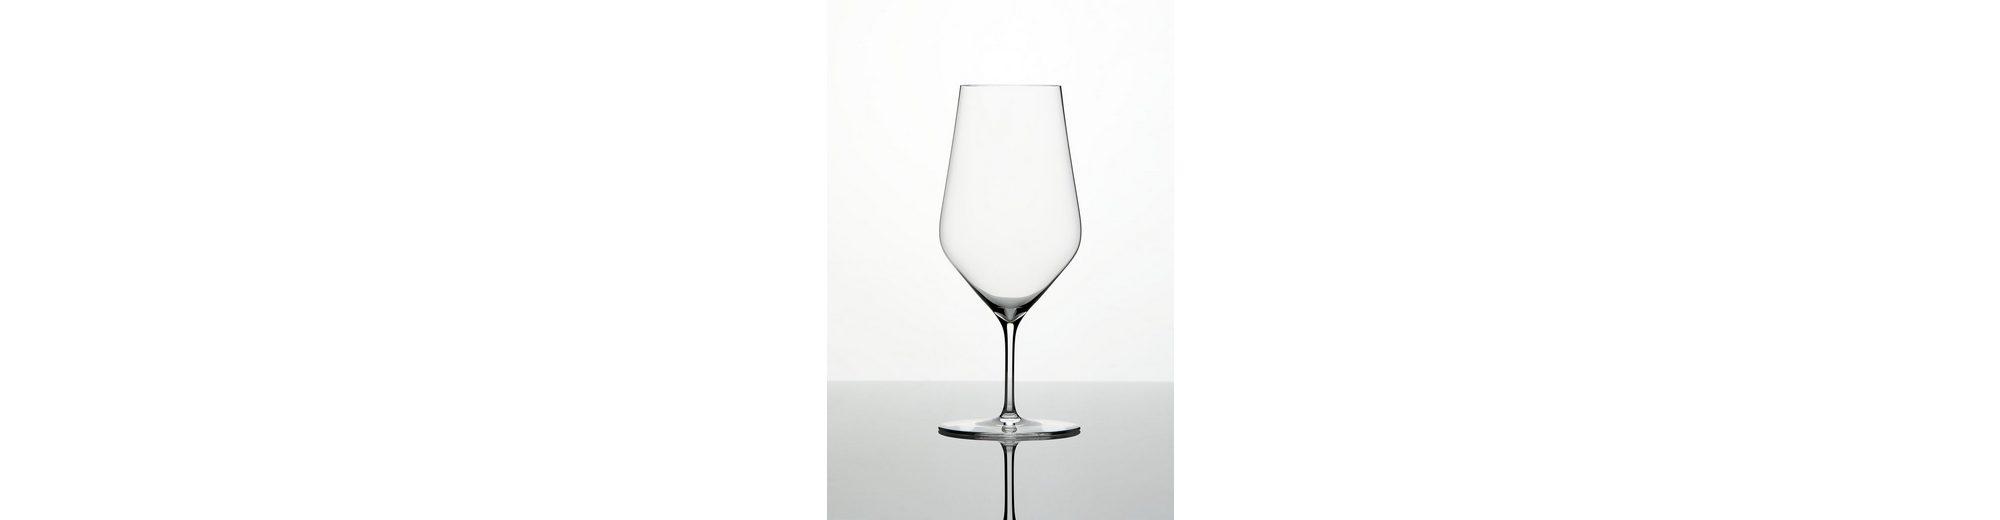 Zalto Denk Art Wasserglas